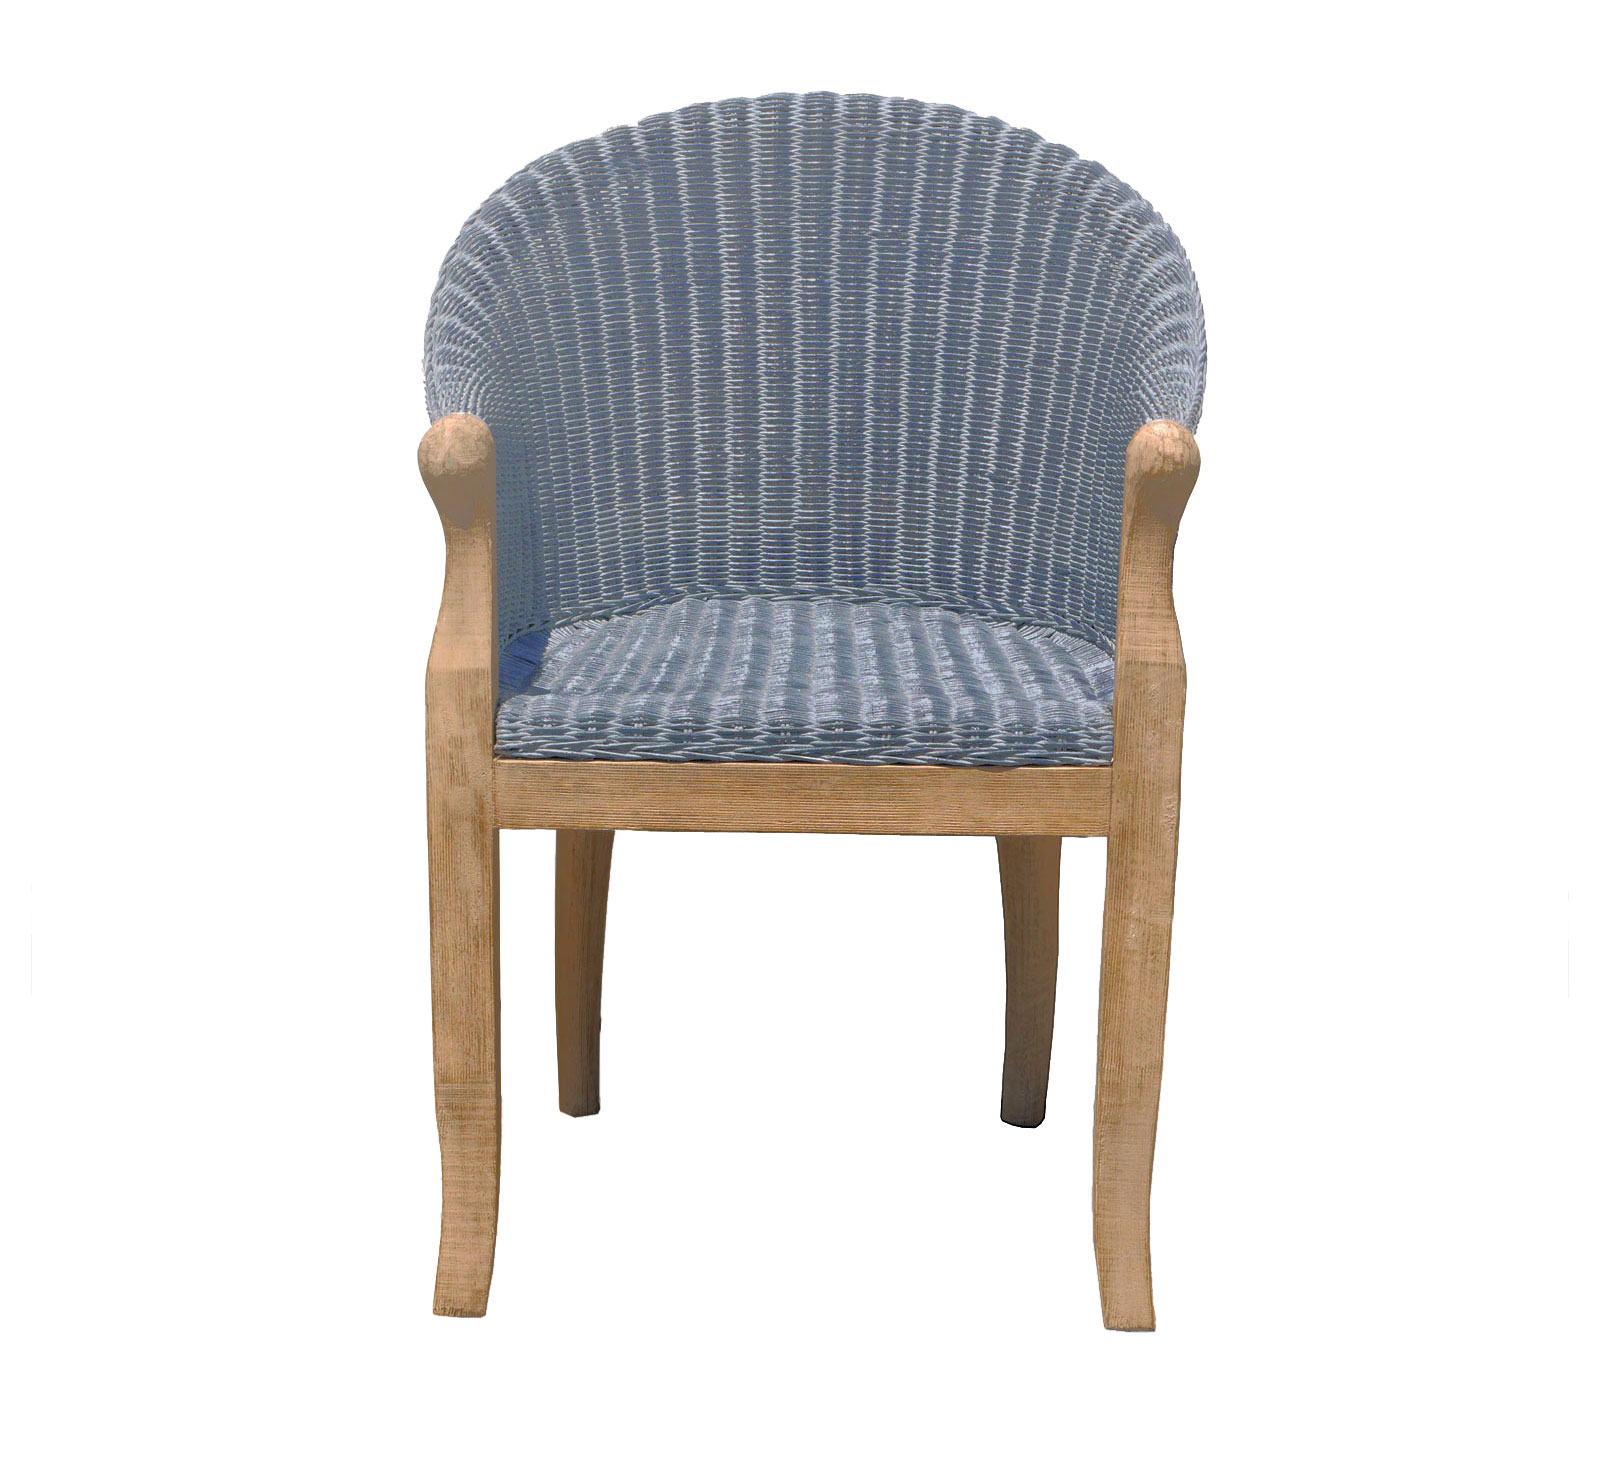 Sam esszimmer stuhl rattan grau cobra mit armlehnen - Stuhl mit armlehne grau ...